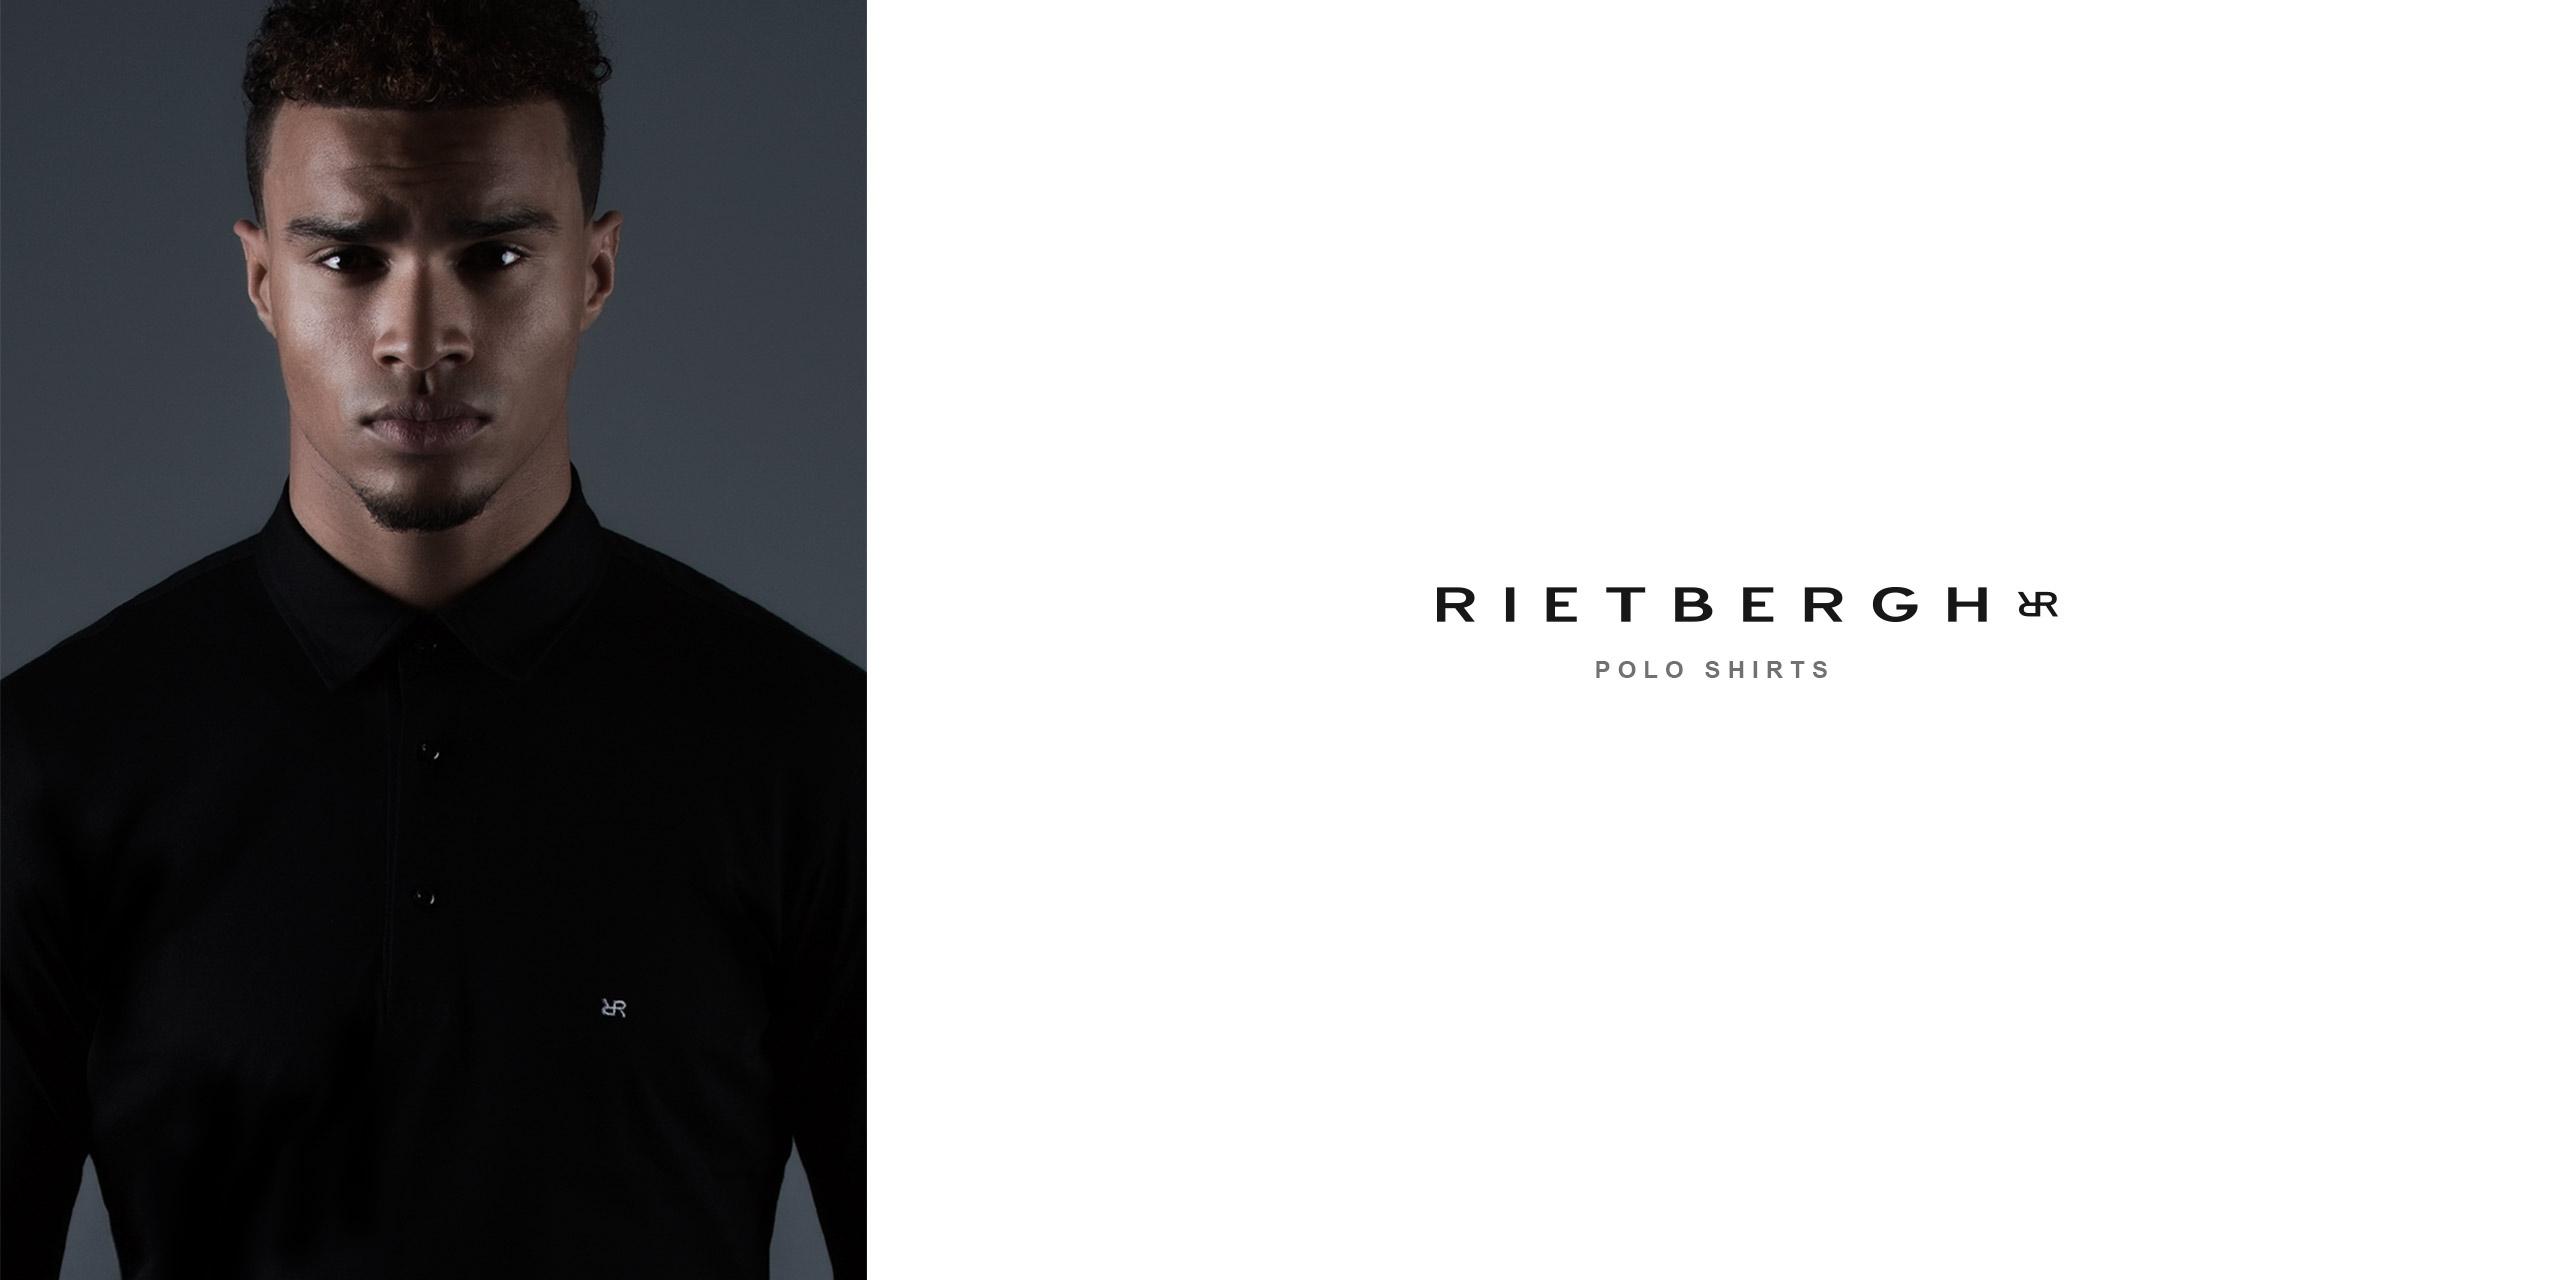 Rietbergh polo shirts